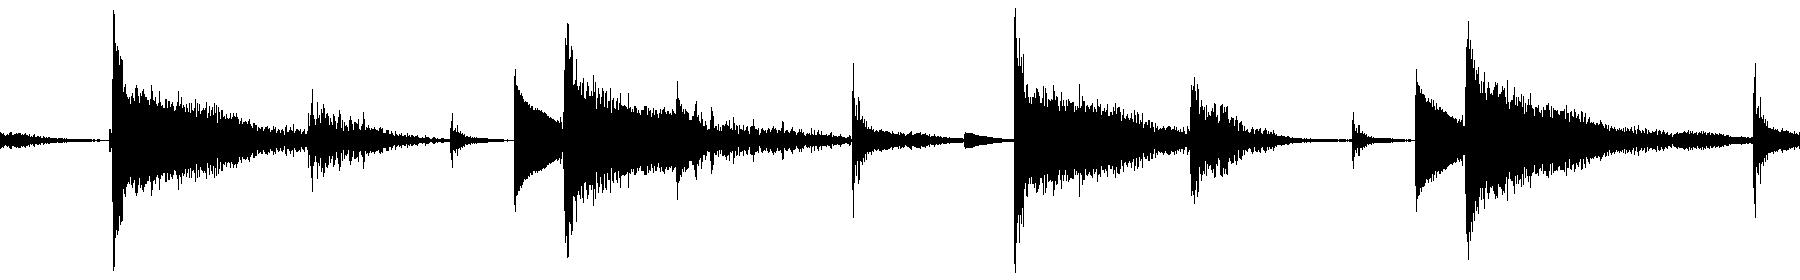 g abs05 036